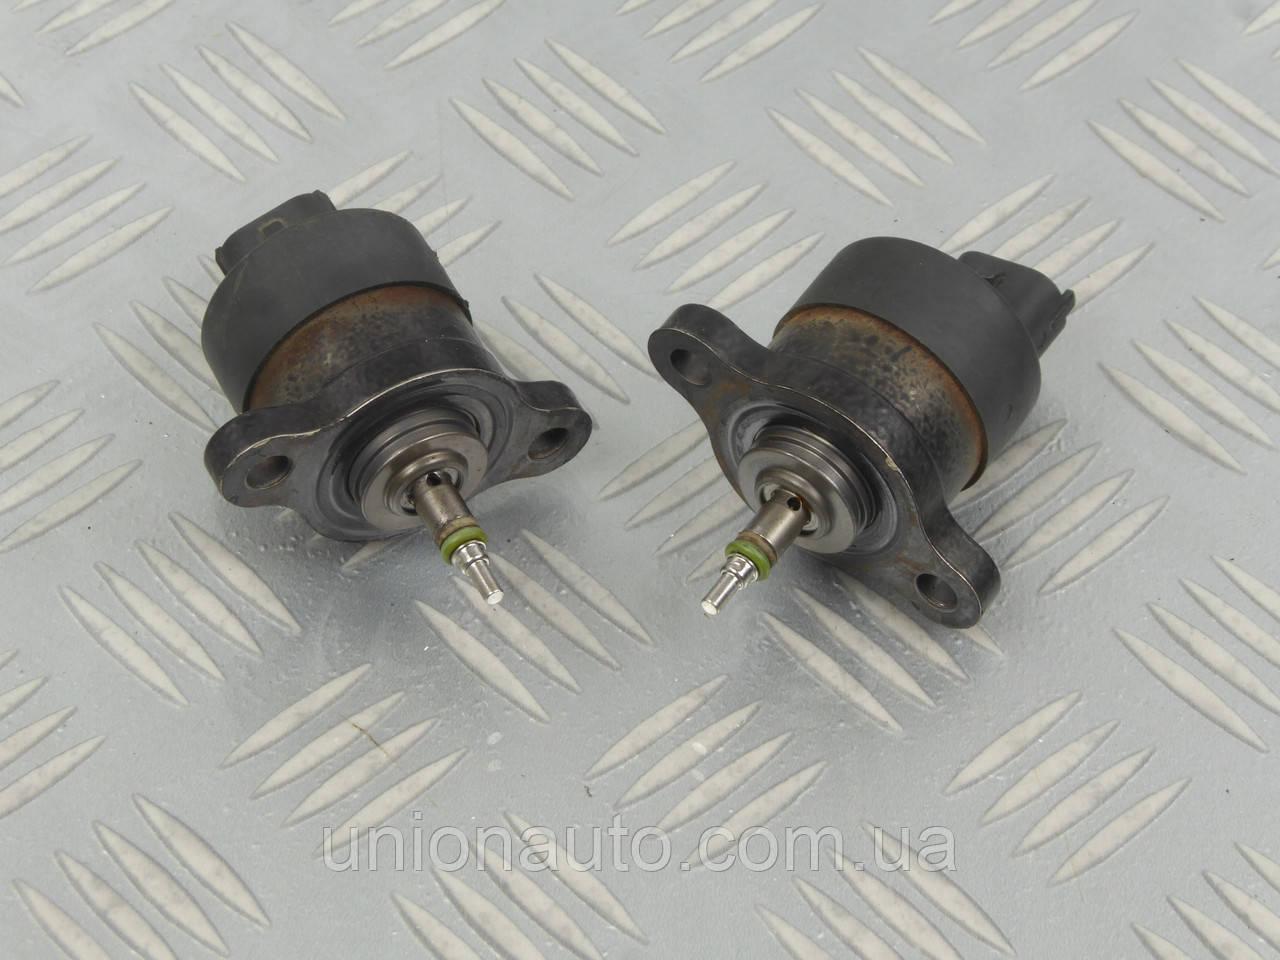 0281002483 Регулятор, клапан давления подачи топлива RENAULT MEGANE SCENIC DCI